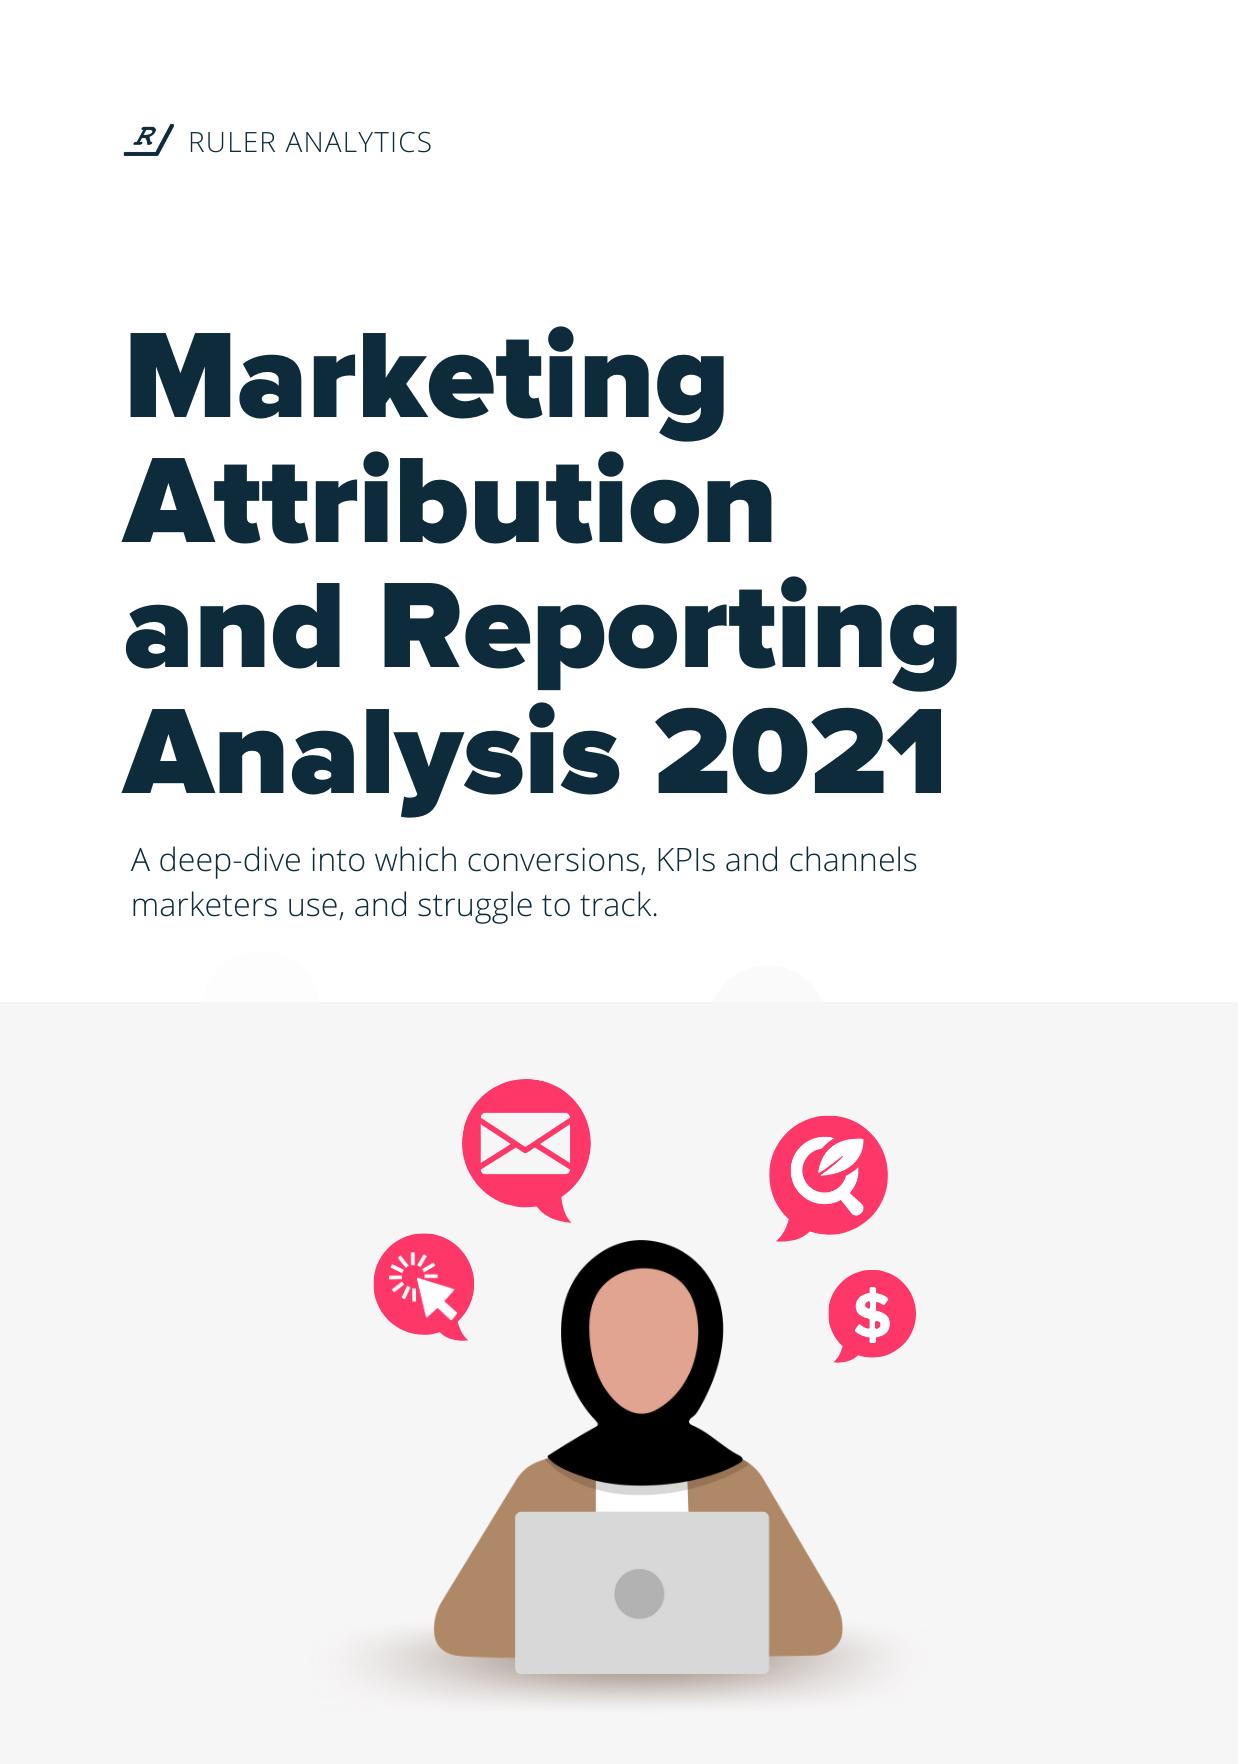 Marketing Attribution and Reporting Analysis 2021